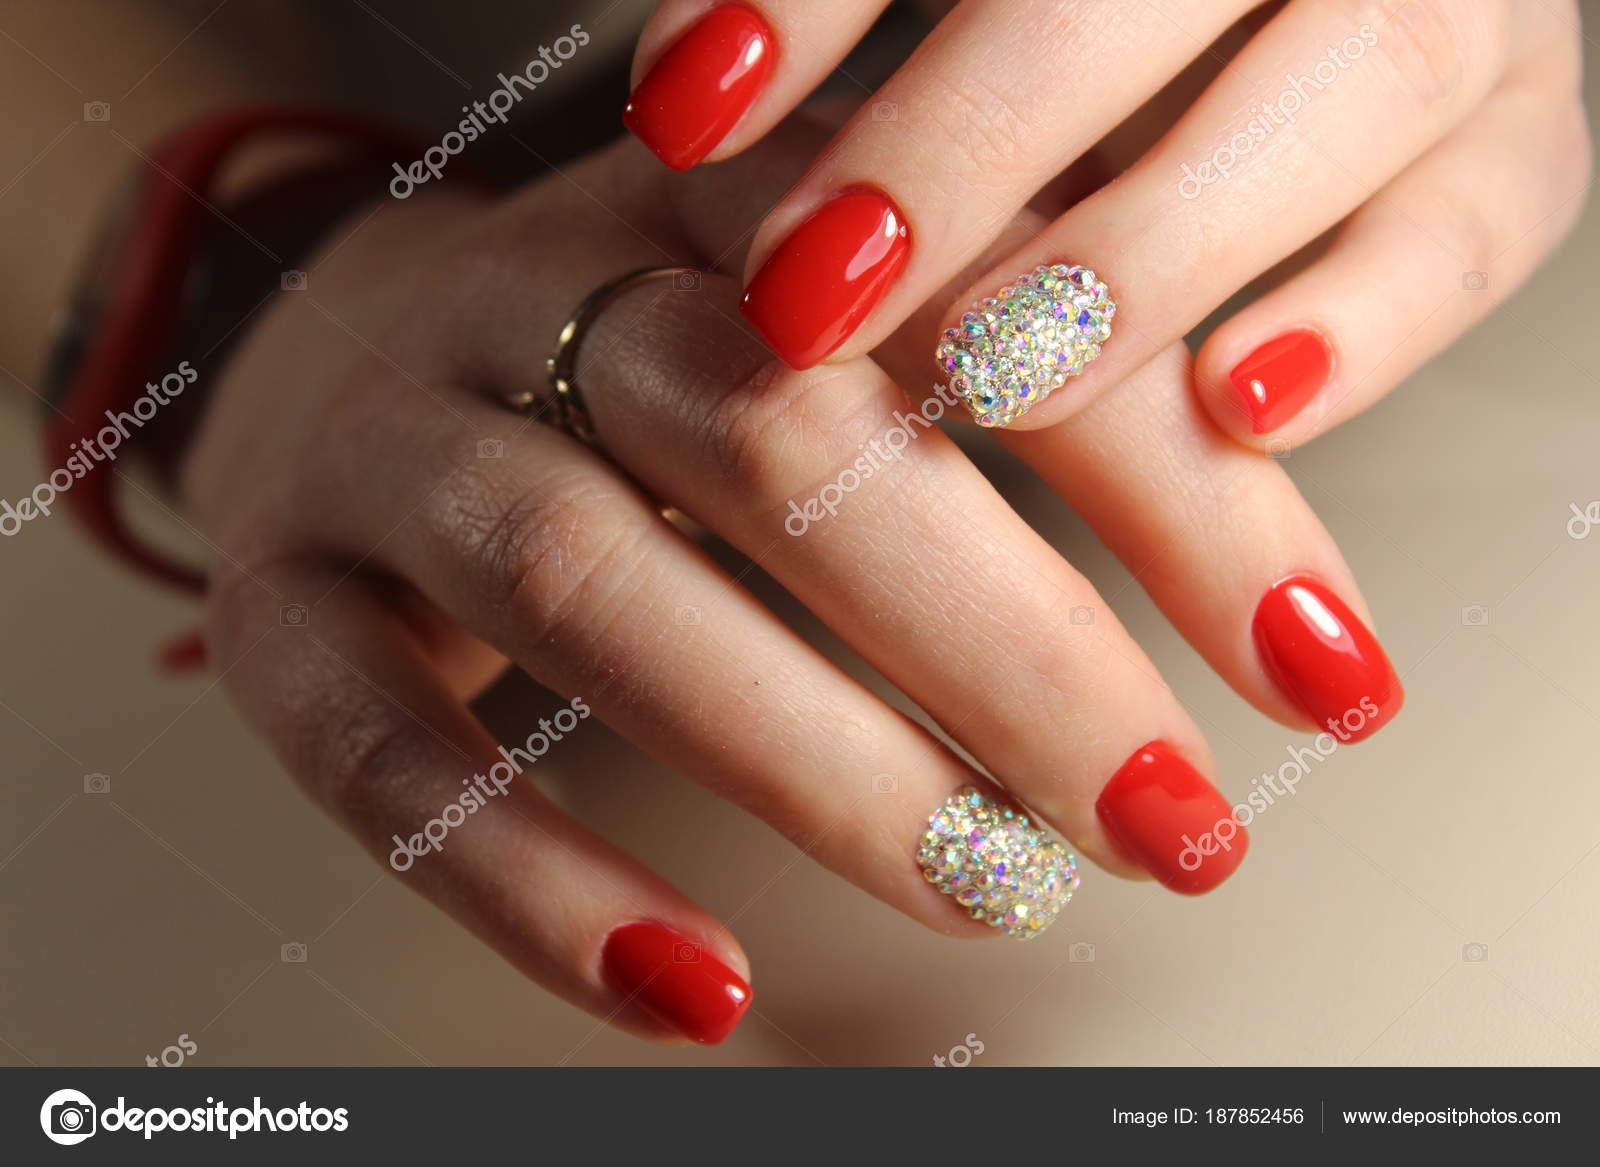 Red Nails With Rhinestones Stock Photo Smirmaxstock